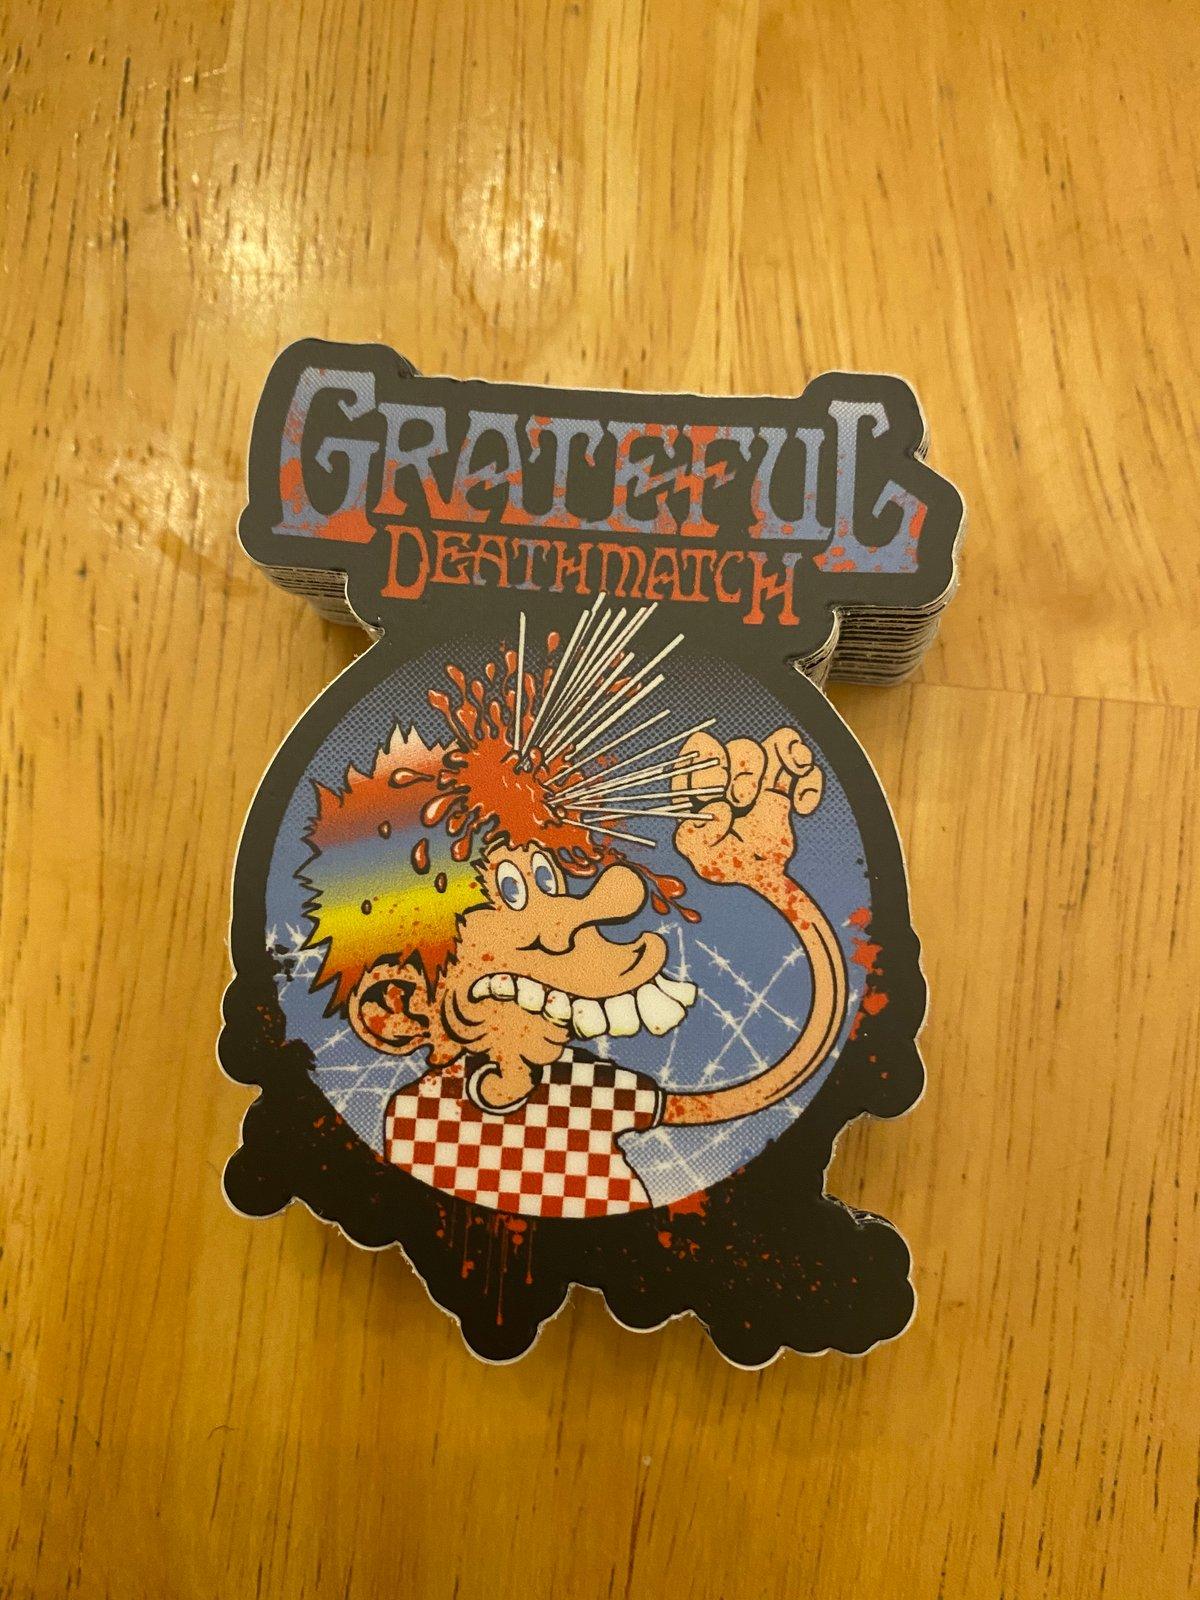 "3"" Grateful Deathmatch skewer logo with text"